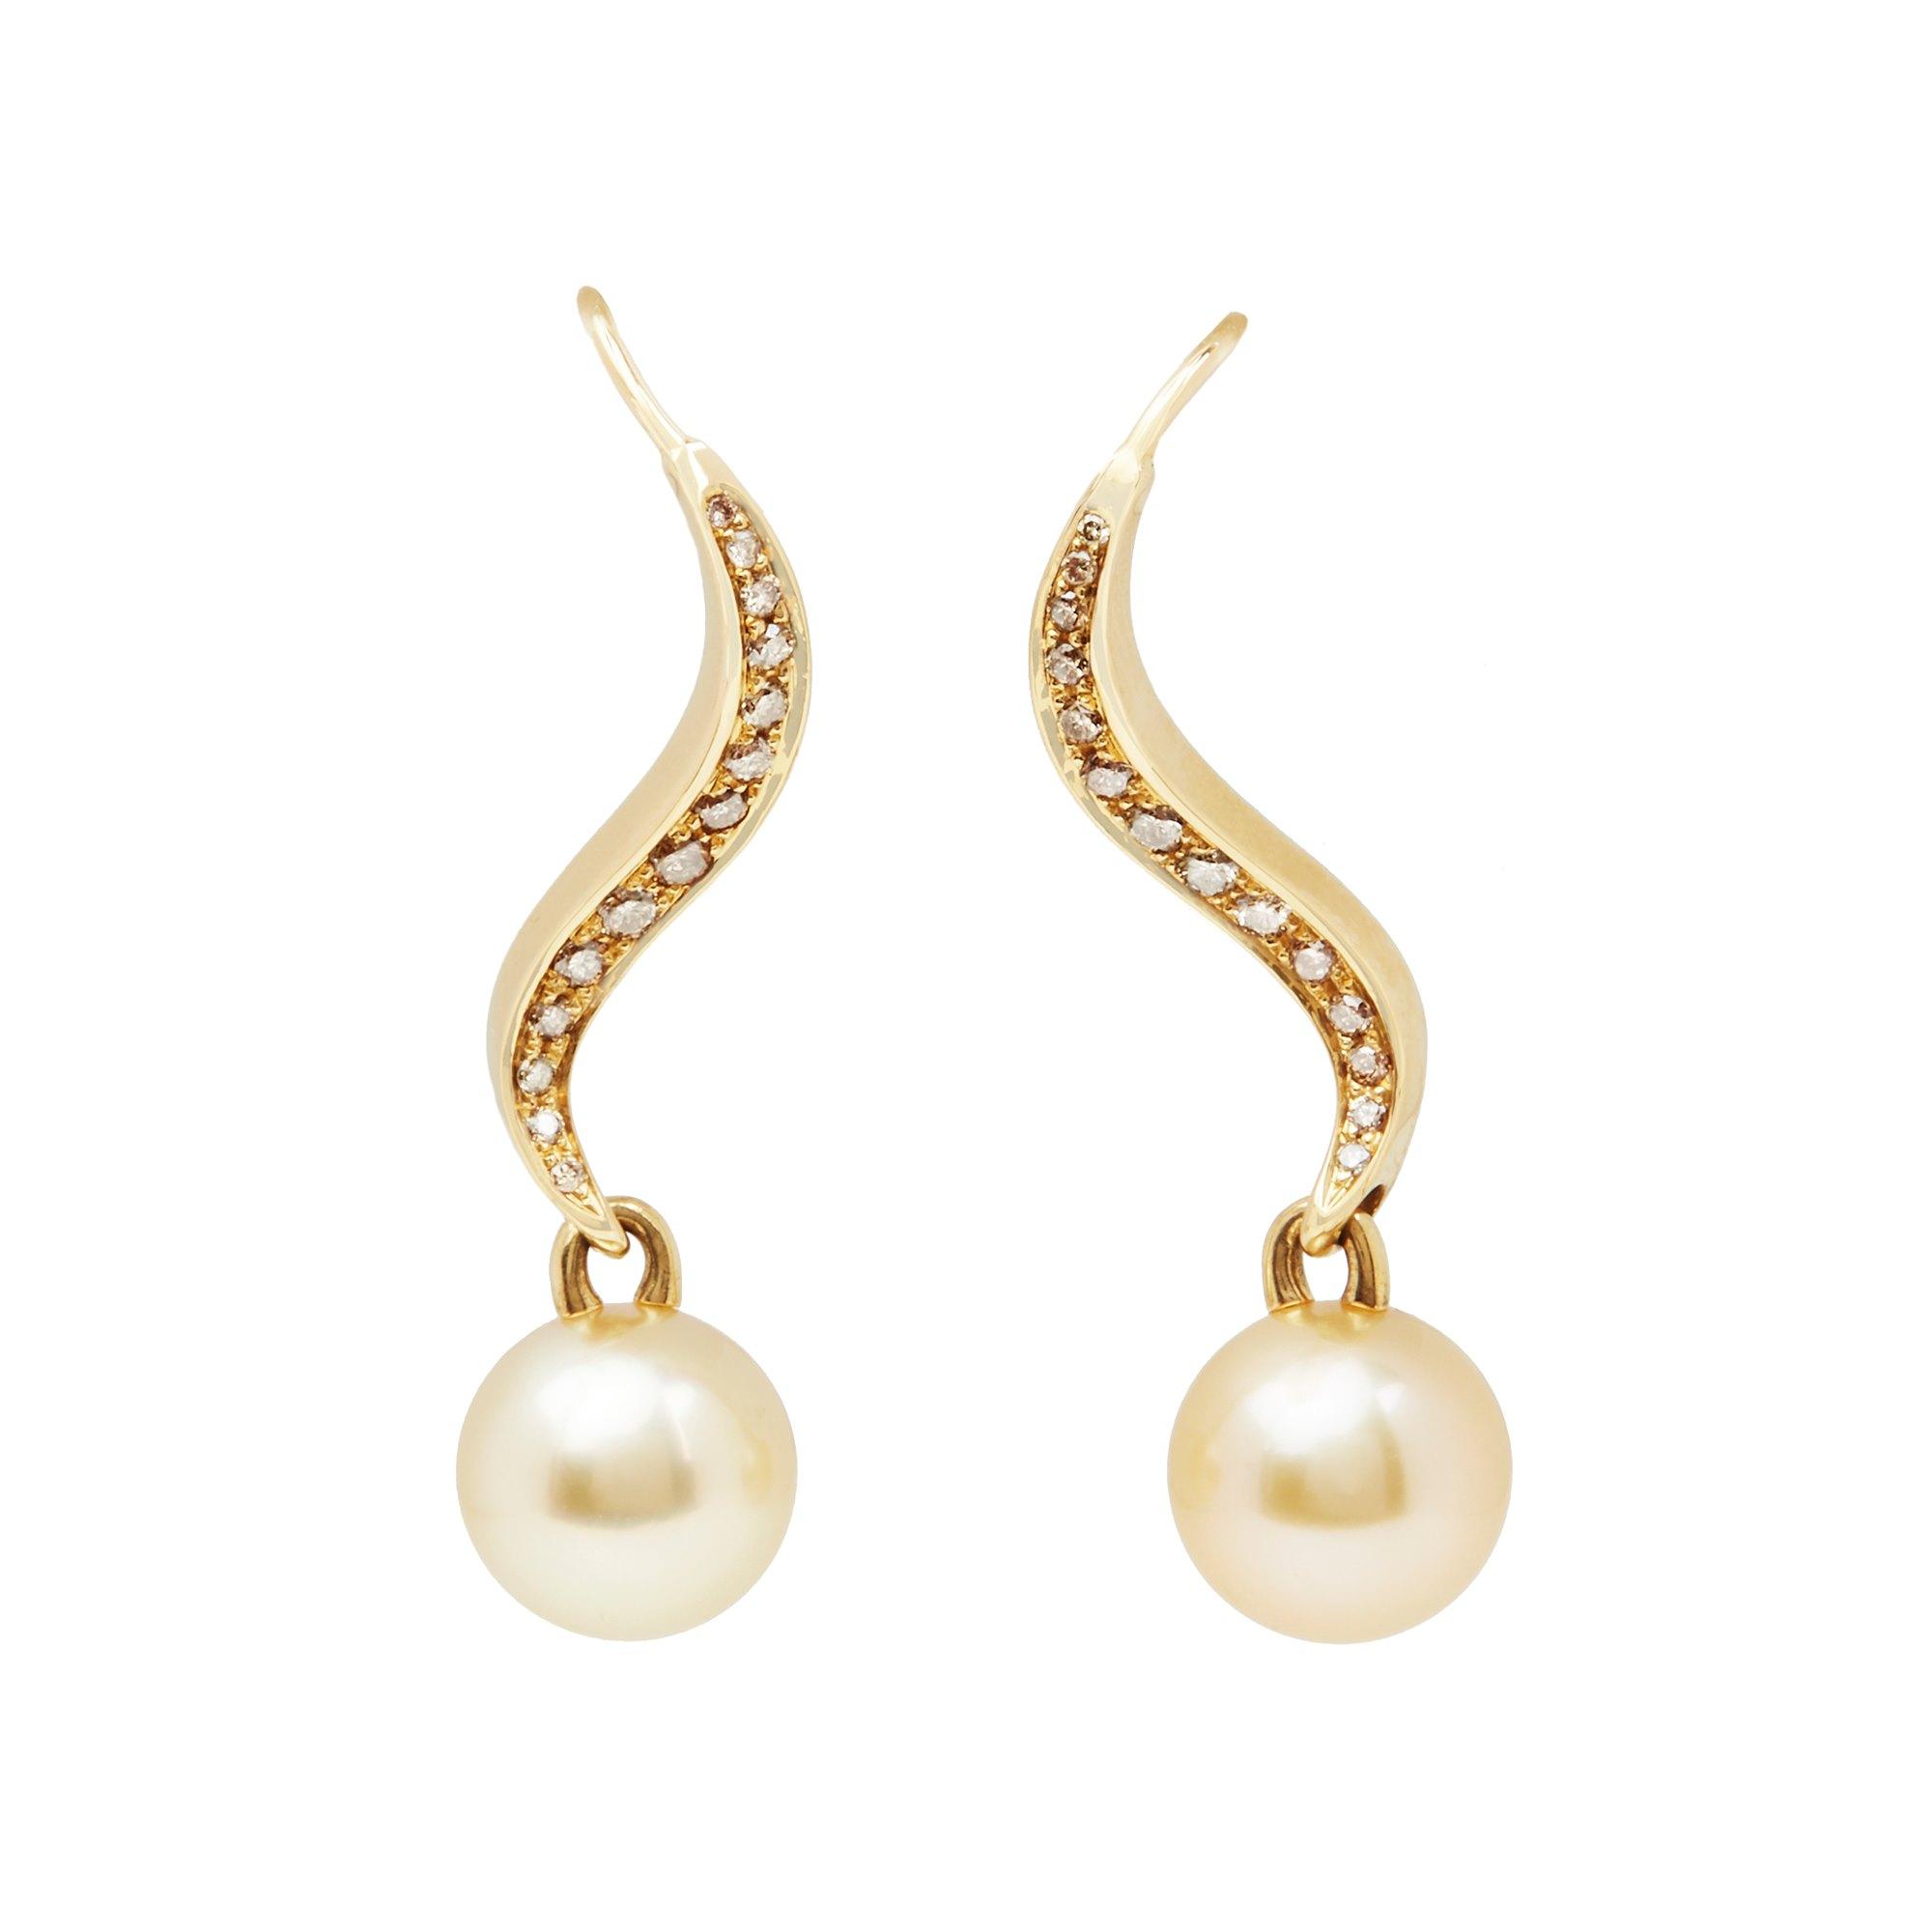 Mikimoto 18k Yellow Gold Akoya Pearl & Diamond Earrings